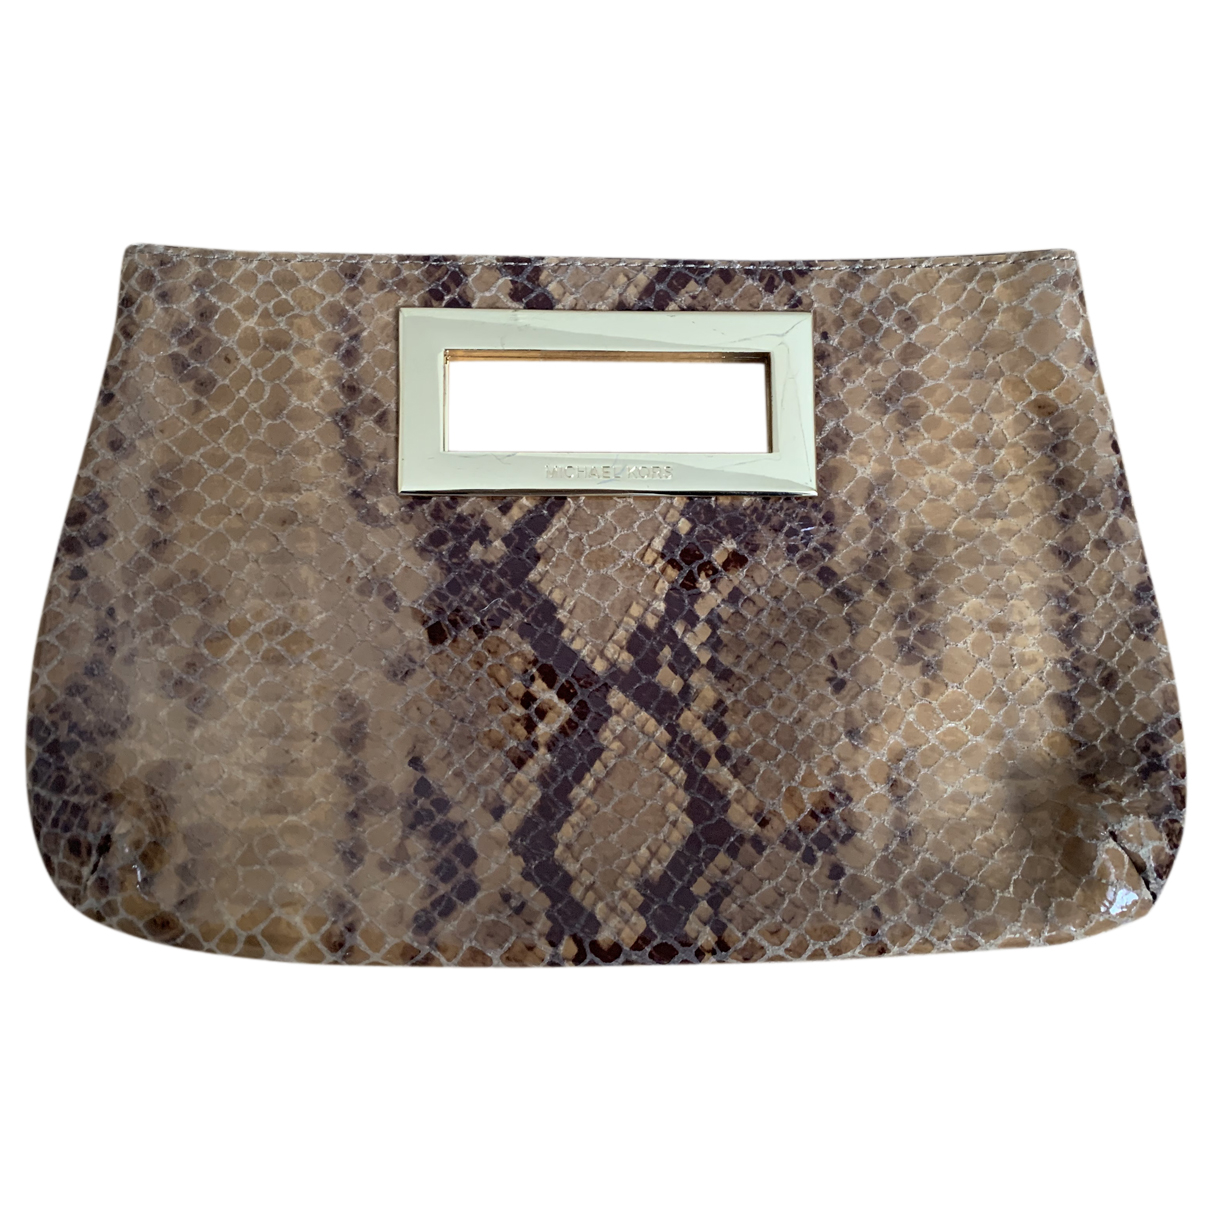 Michael Kors N Camel Leather Clutch bag for Women N